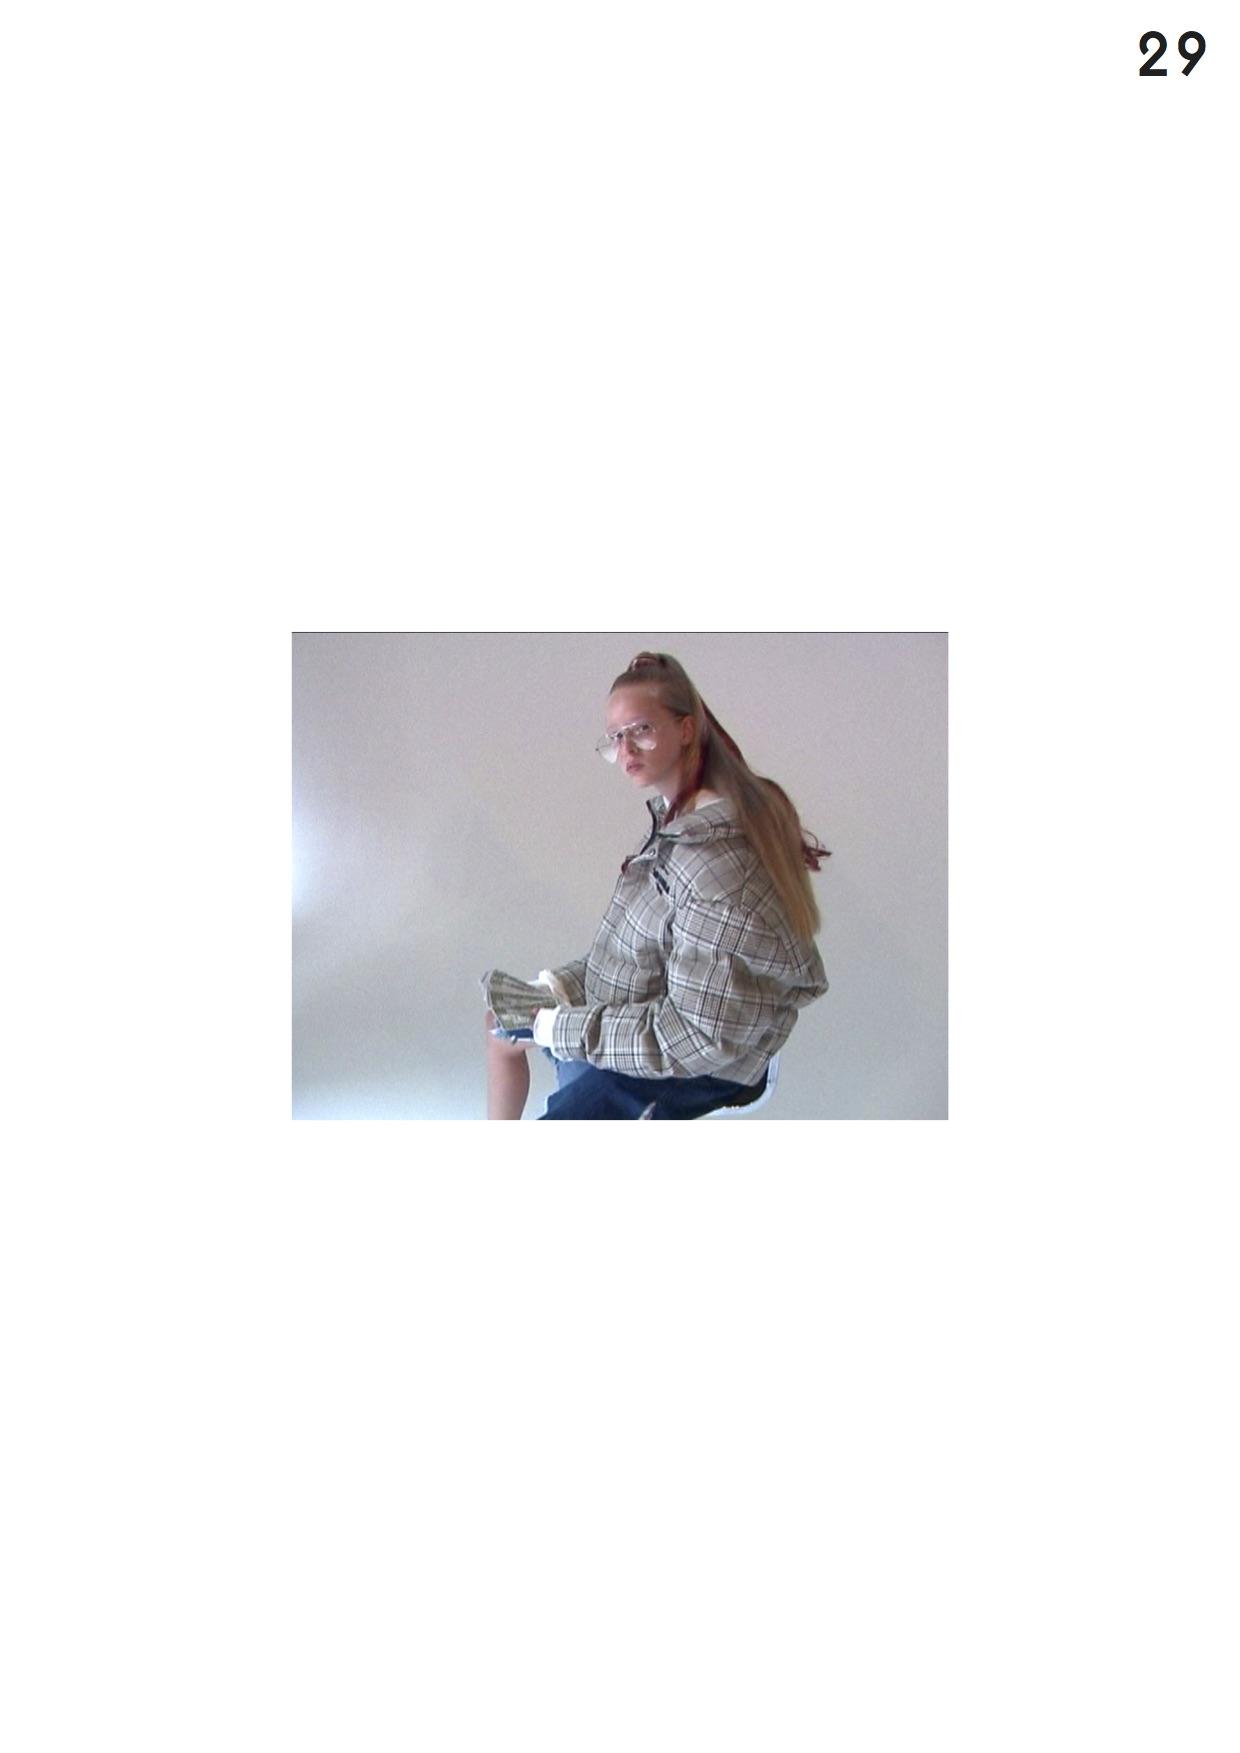 GZ_ss19_commercial_singlep29.jpg